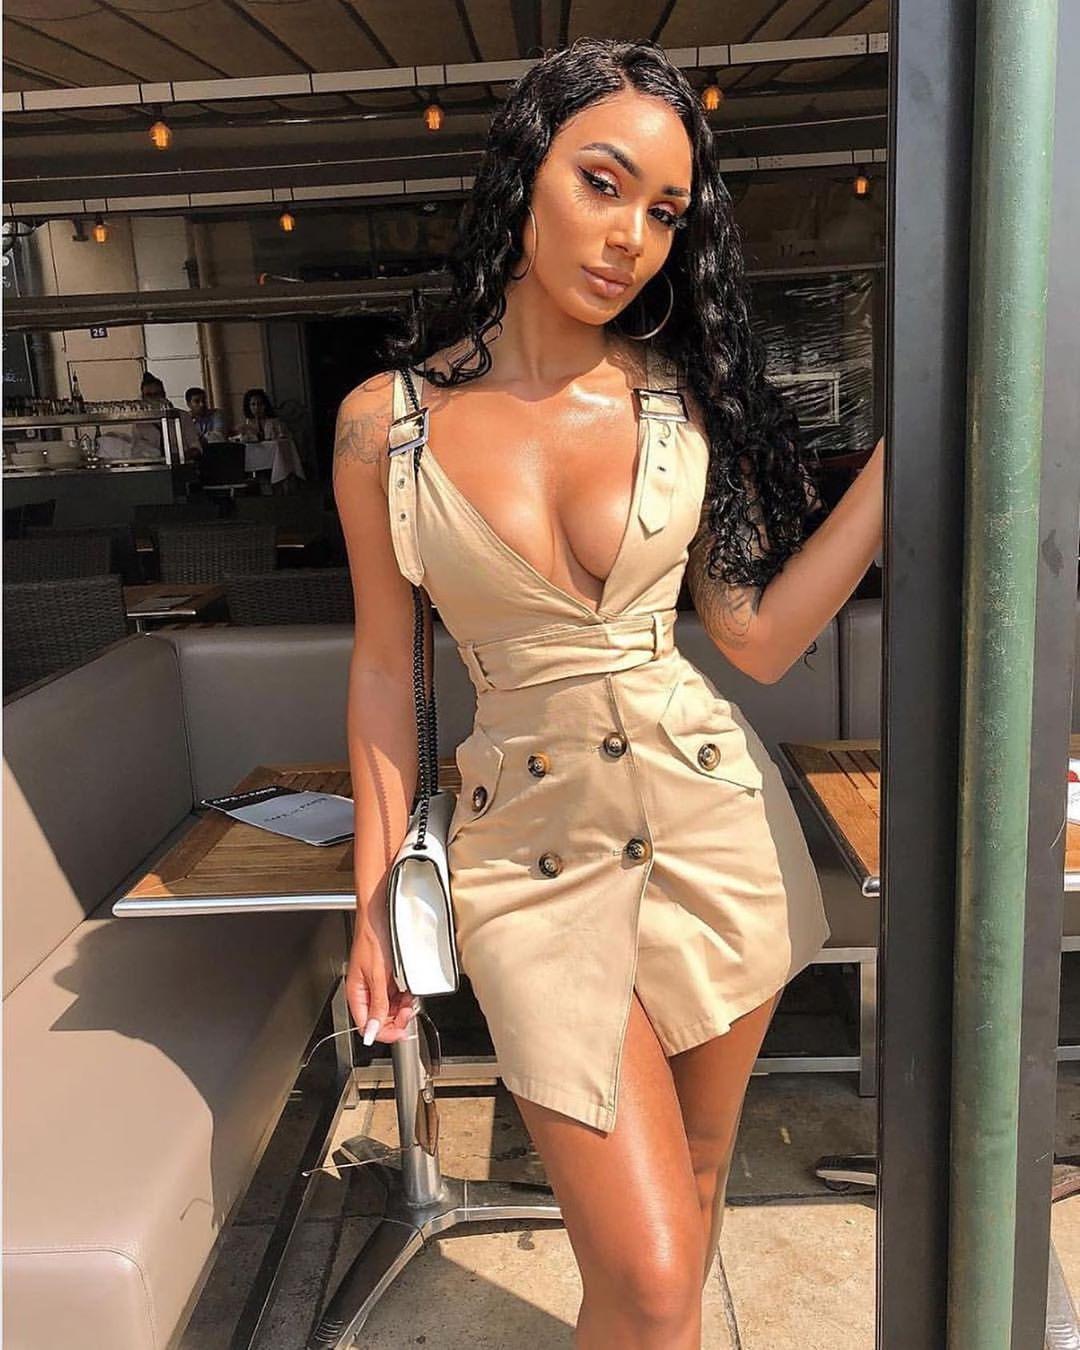 When your outfit is Yaaas girls thats our Dora Dress heysandra.ae   sandra  heysandra  dubai  dubaigirls  dubaitag  dubailife  dubaistyle  dubailifestyle  dubaifashioninsta  dubaifashion  dubaibeauty  mydubai  fashion  dxb  fashionblog  fashionblogger  instafashion  fashionable  style  styleblog